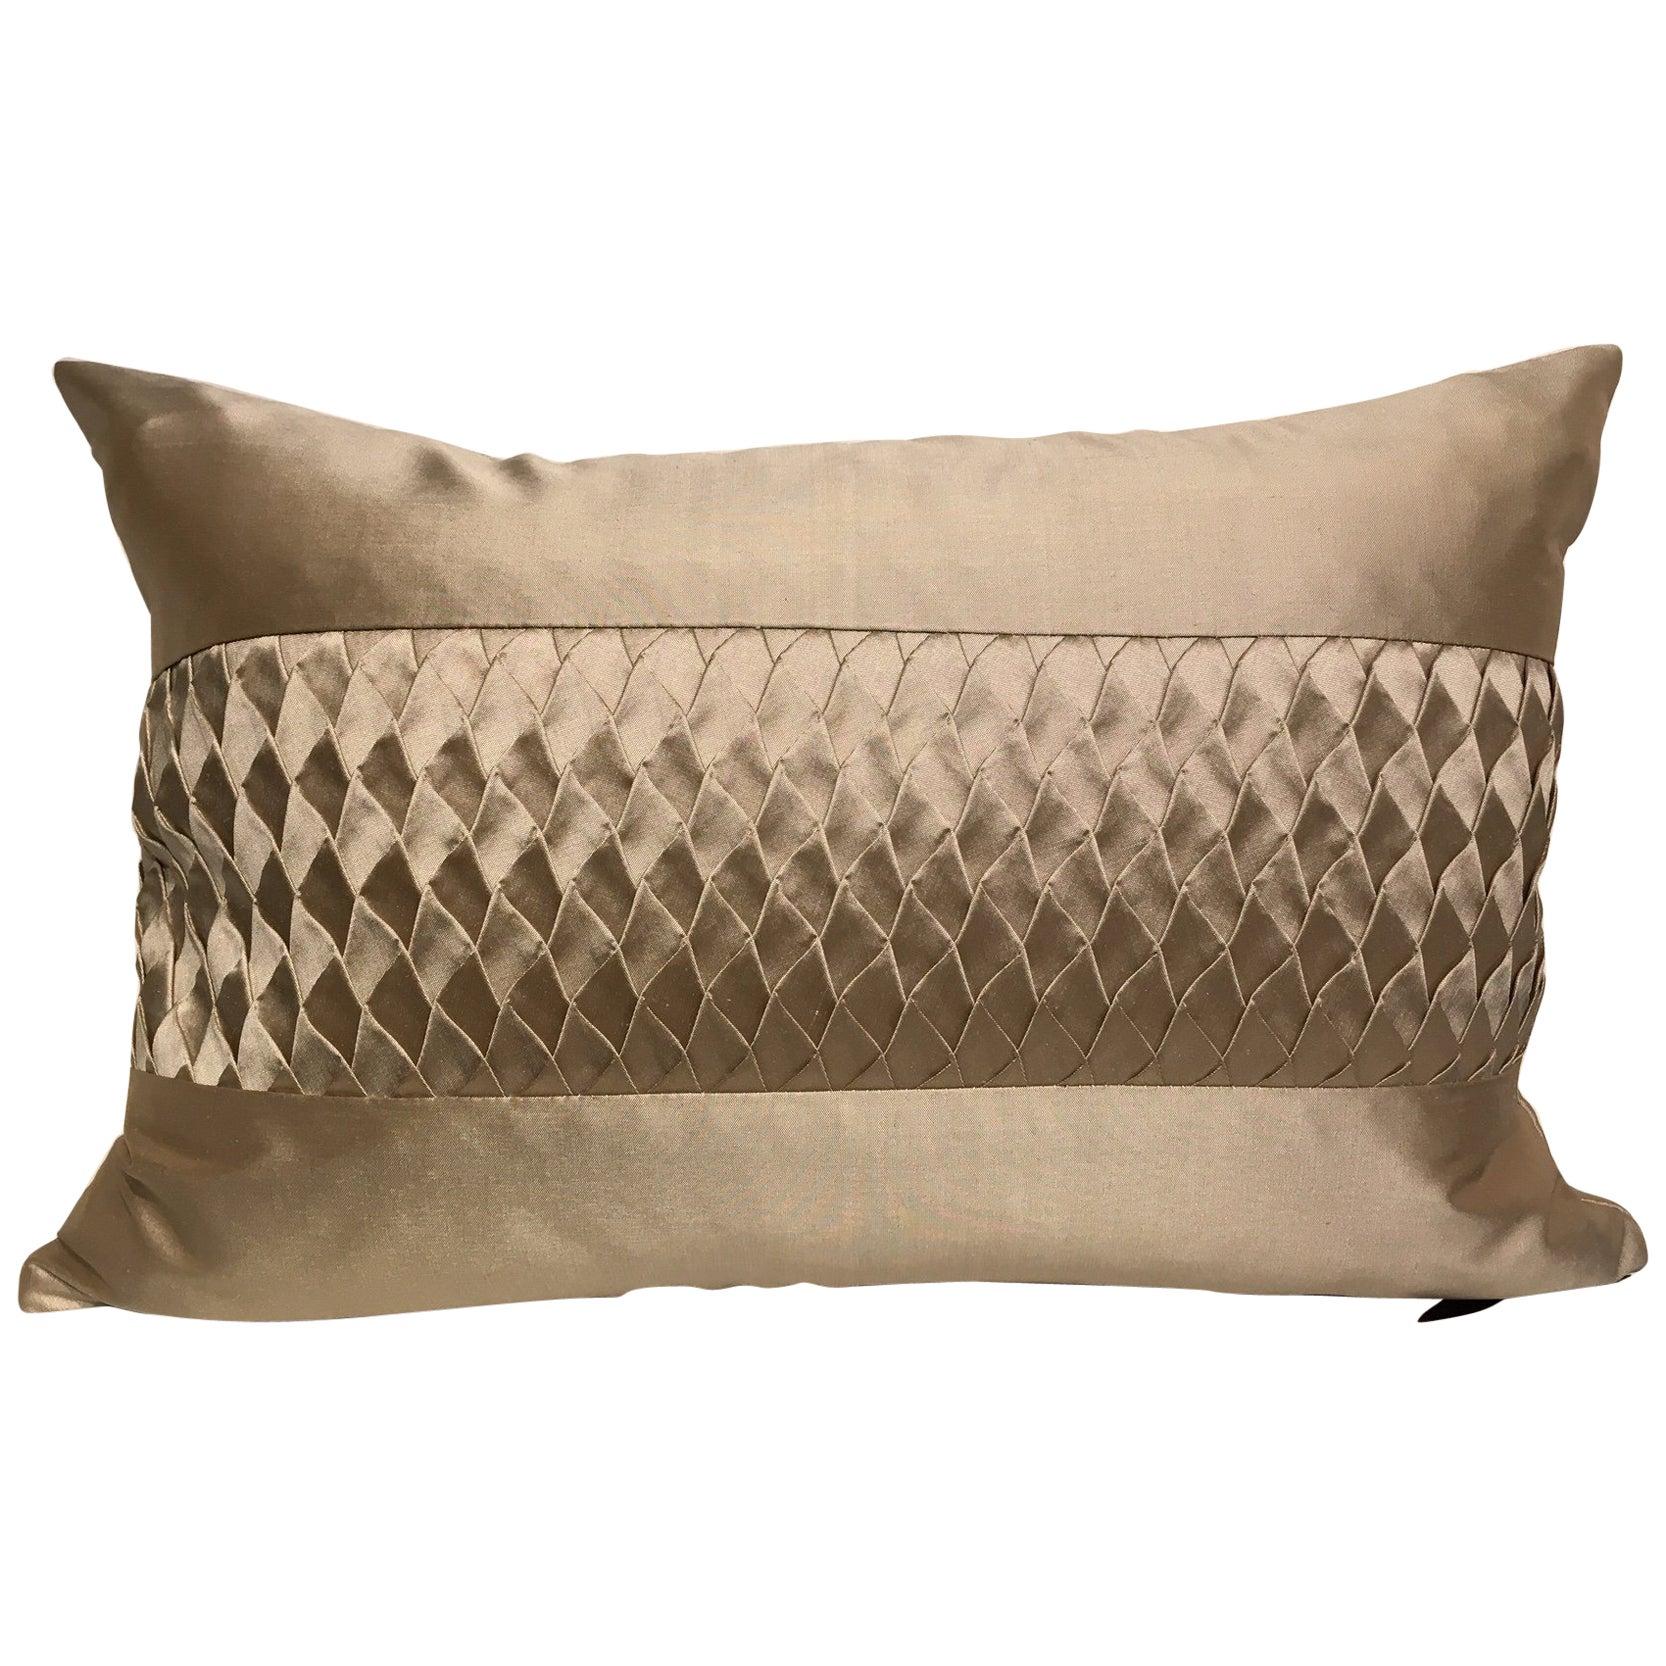 Coomba Square Cotton Pillow Cover